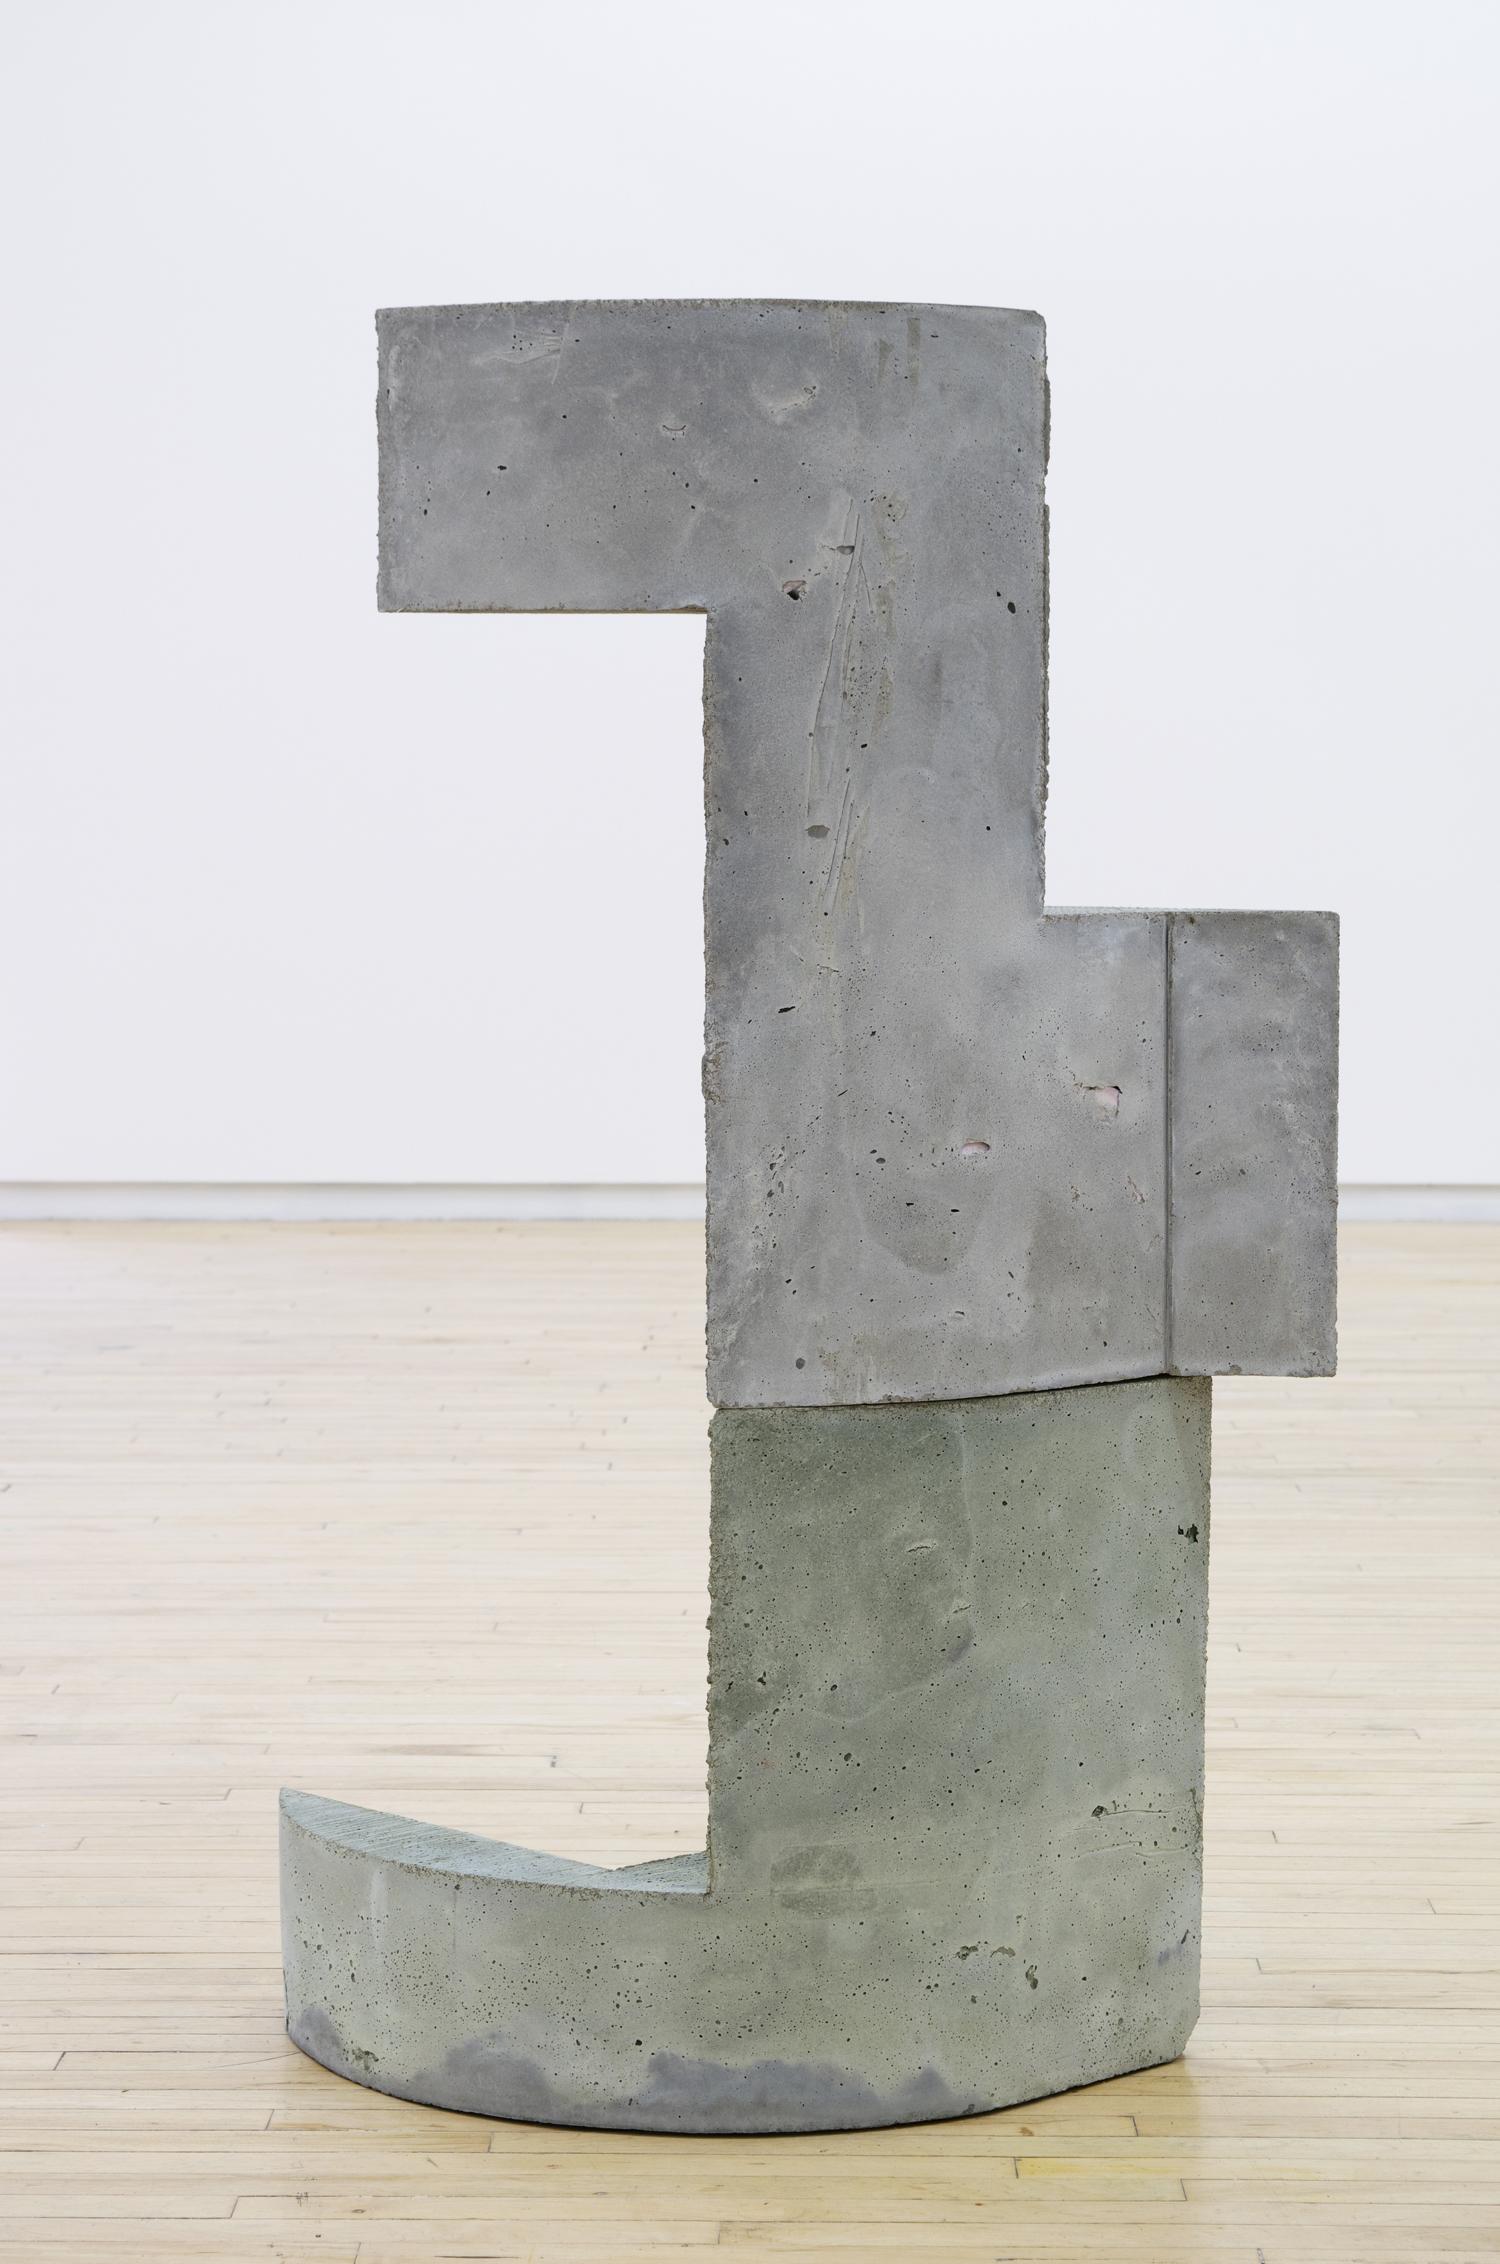 Yna , 2016, 45 x 28 x 12 inches, concrete